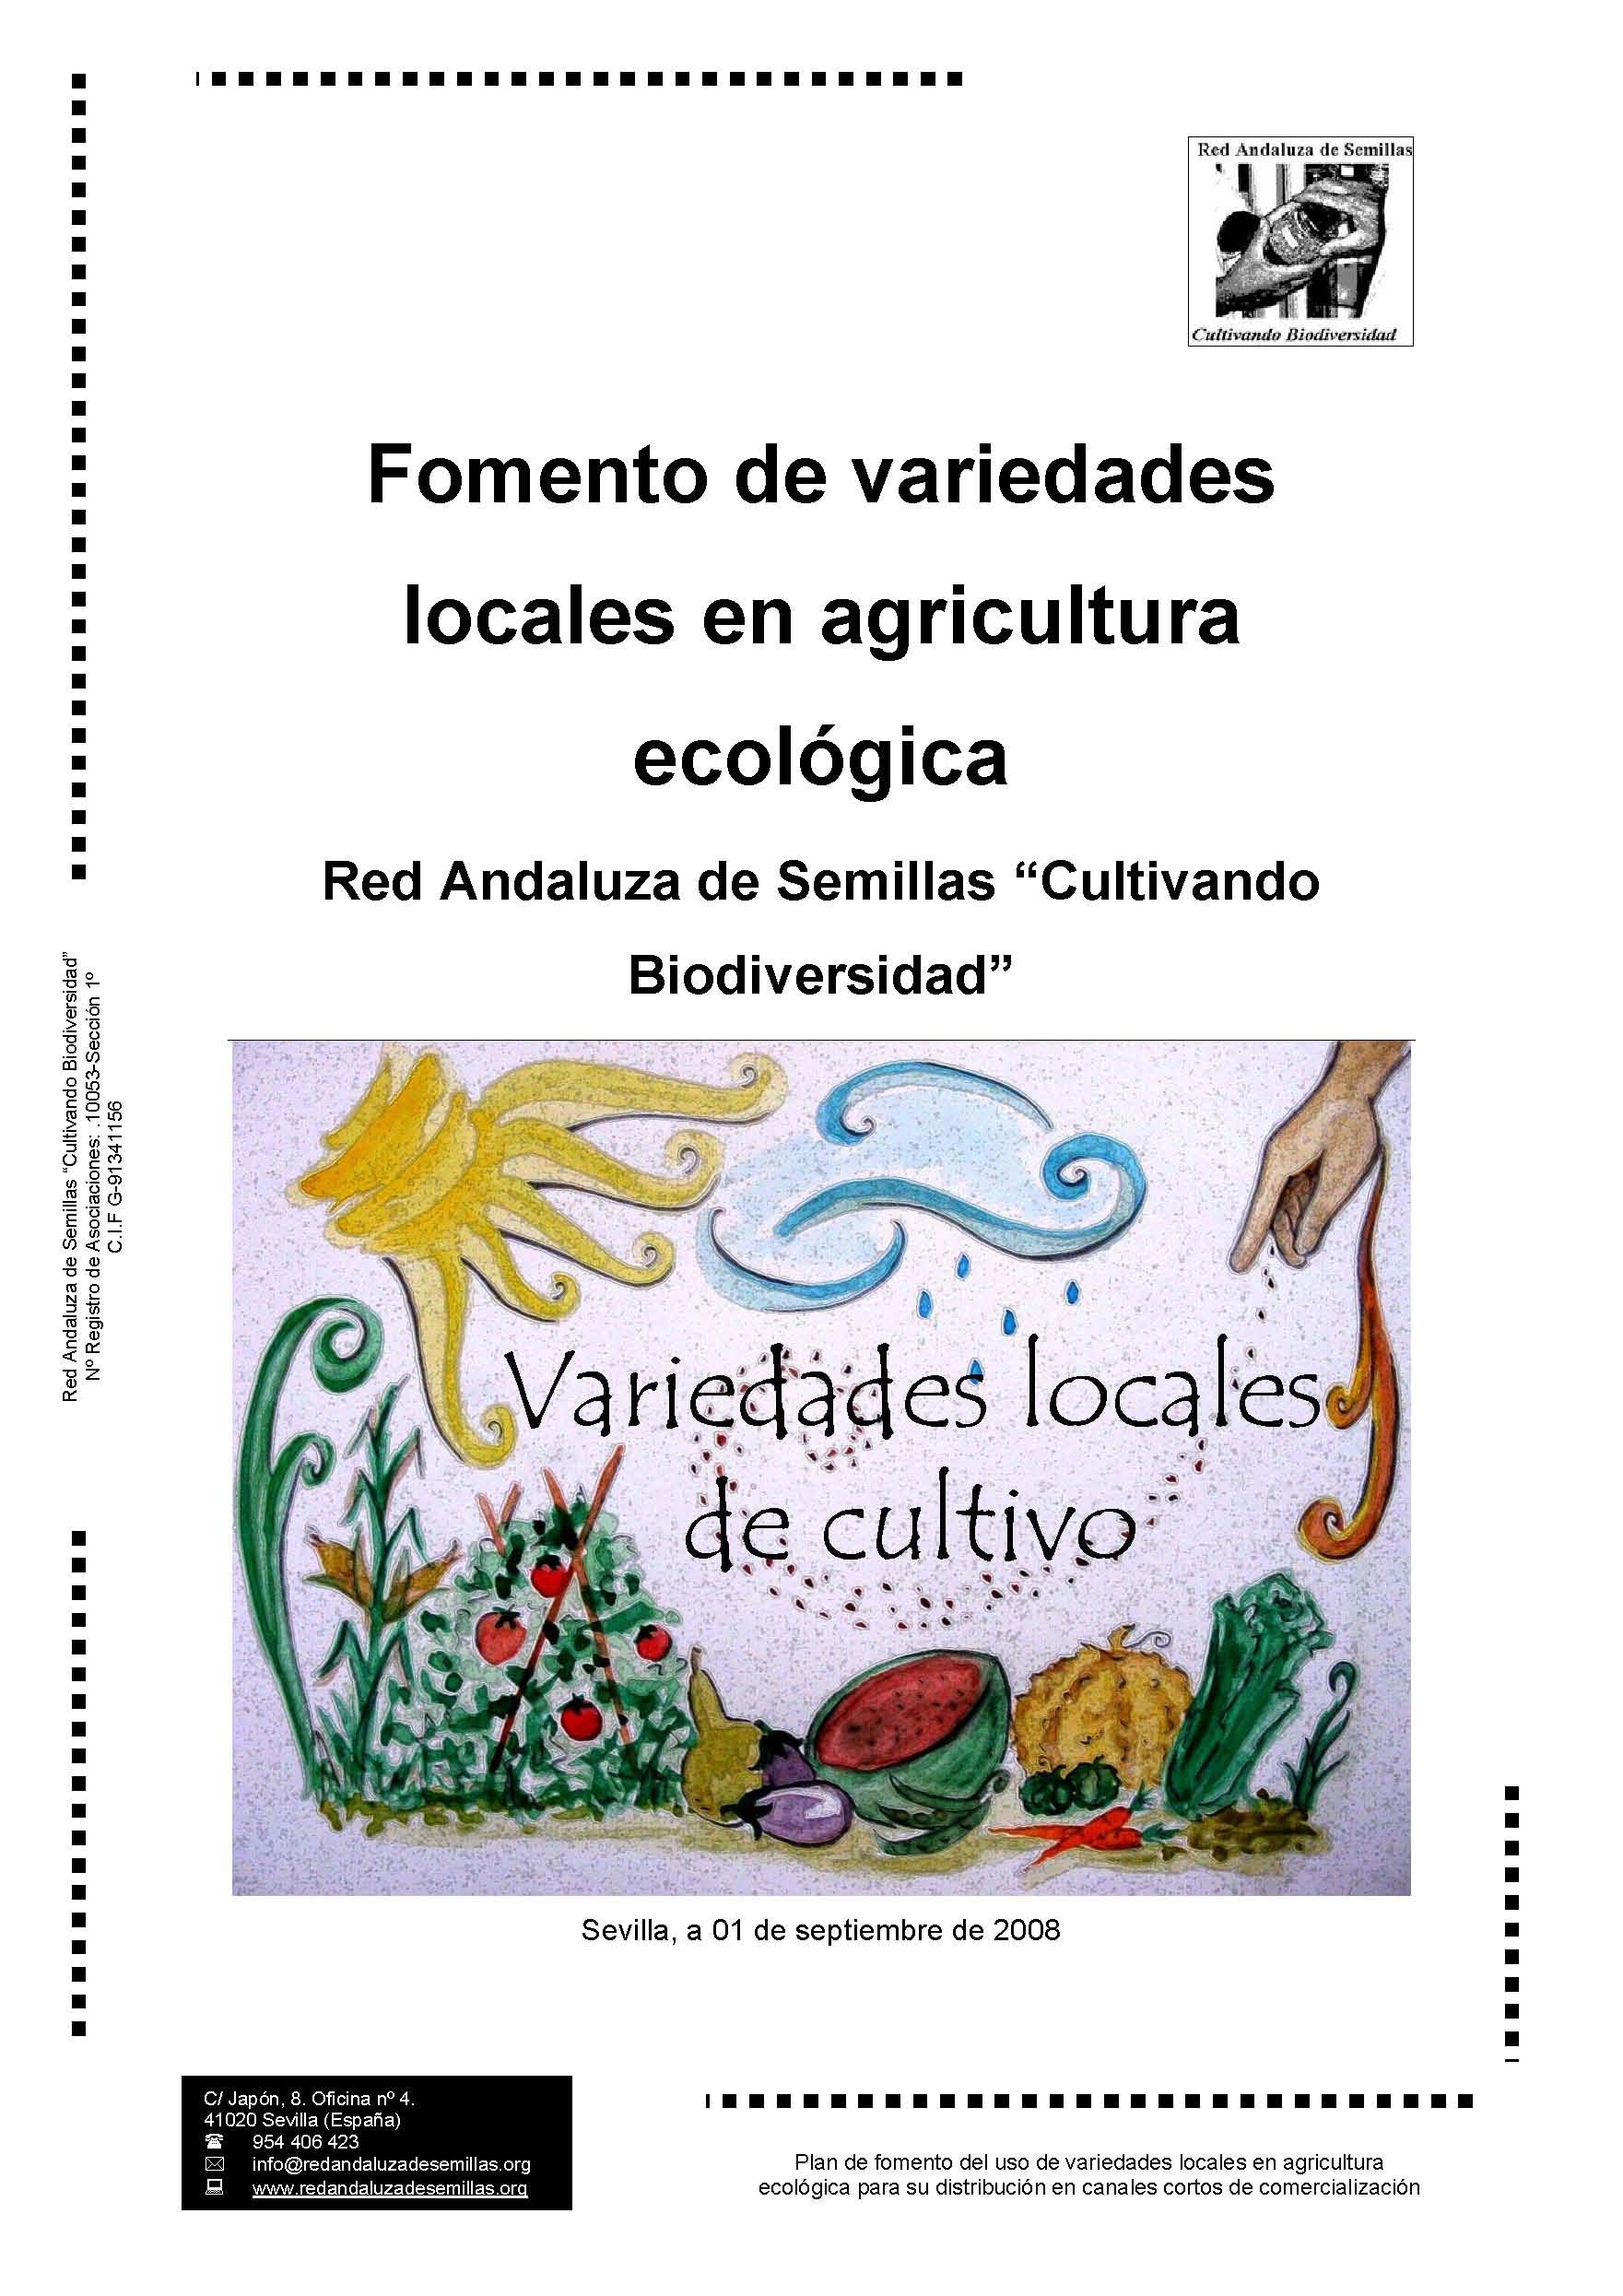 paginas-de-plan-fomento-variedades-locales-ae-ras-08-b.jpg